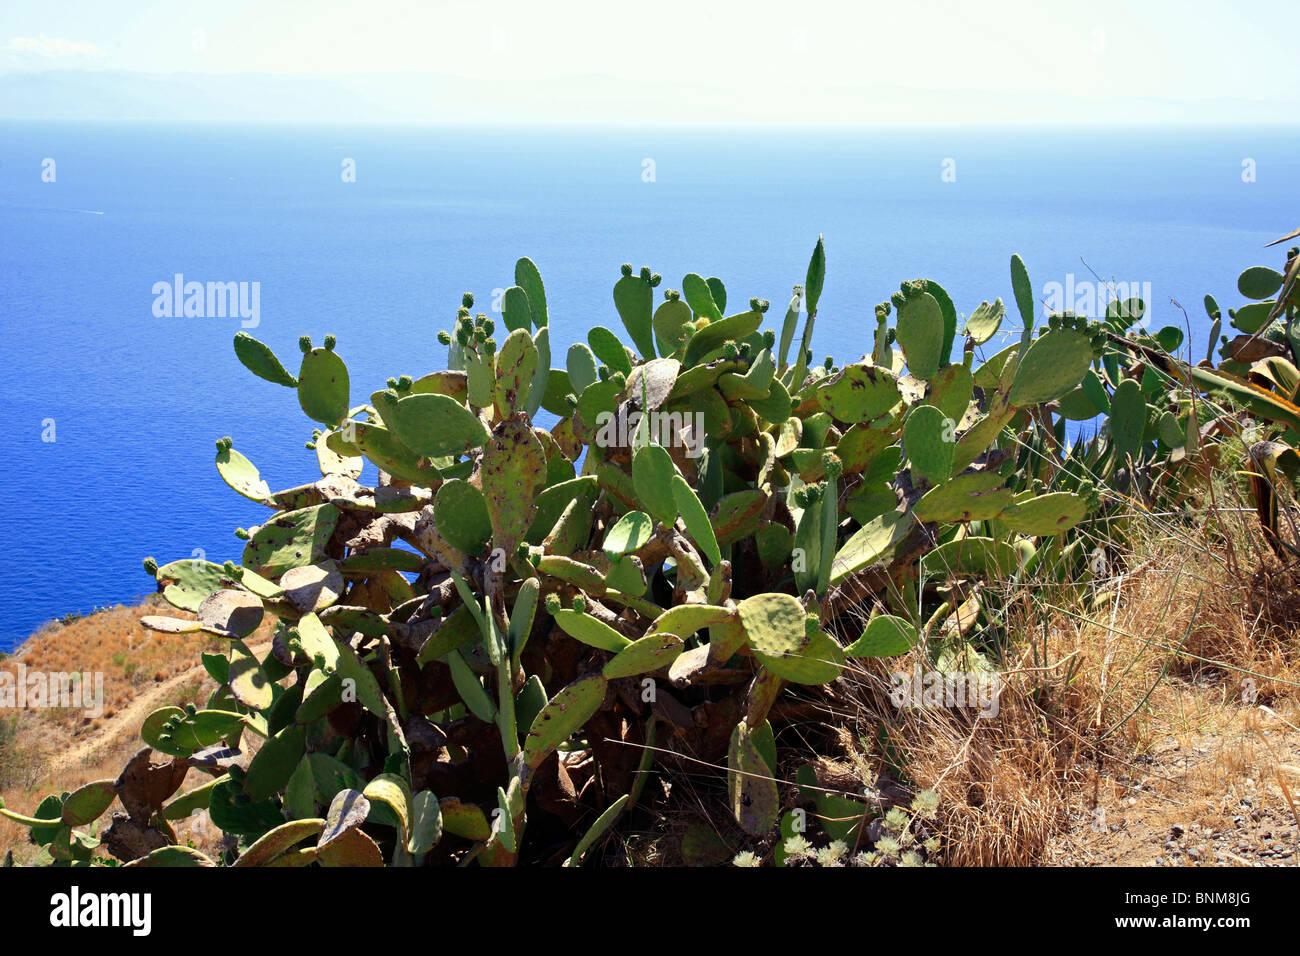 nature plant life cactus prickly pear Opuntia ficus-indica Tyrrhenian Sea Mediterranean Sea Italy - Stock Image